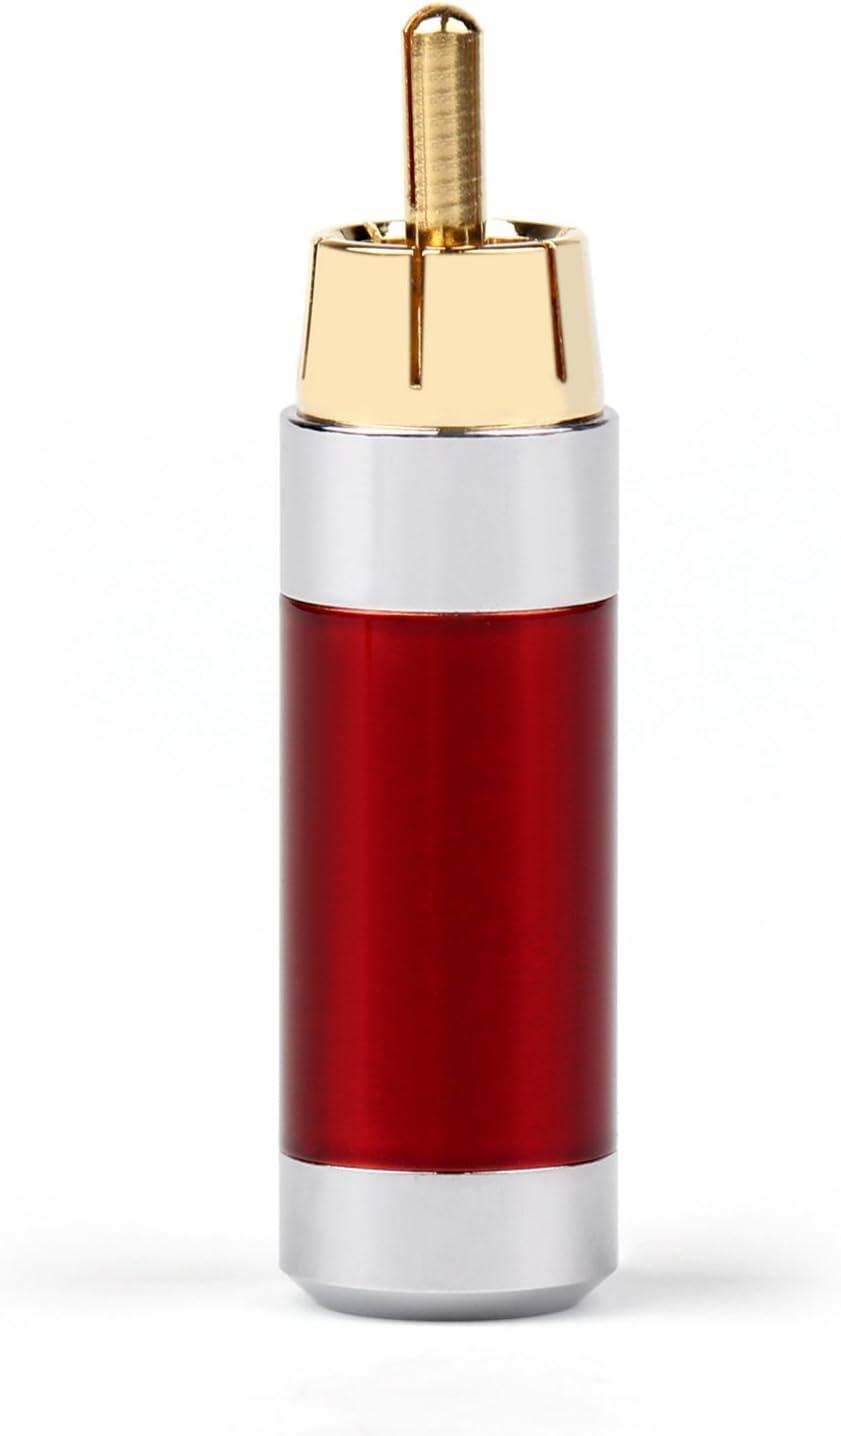 20 lot high quality Copper Rhodium Plated Carbon Fiber RCA Plug Solder ADAPTER